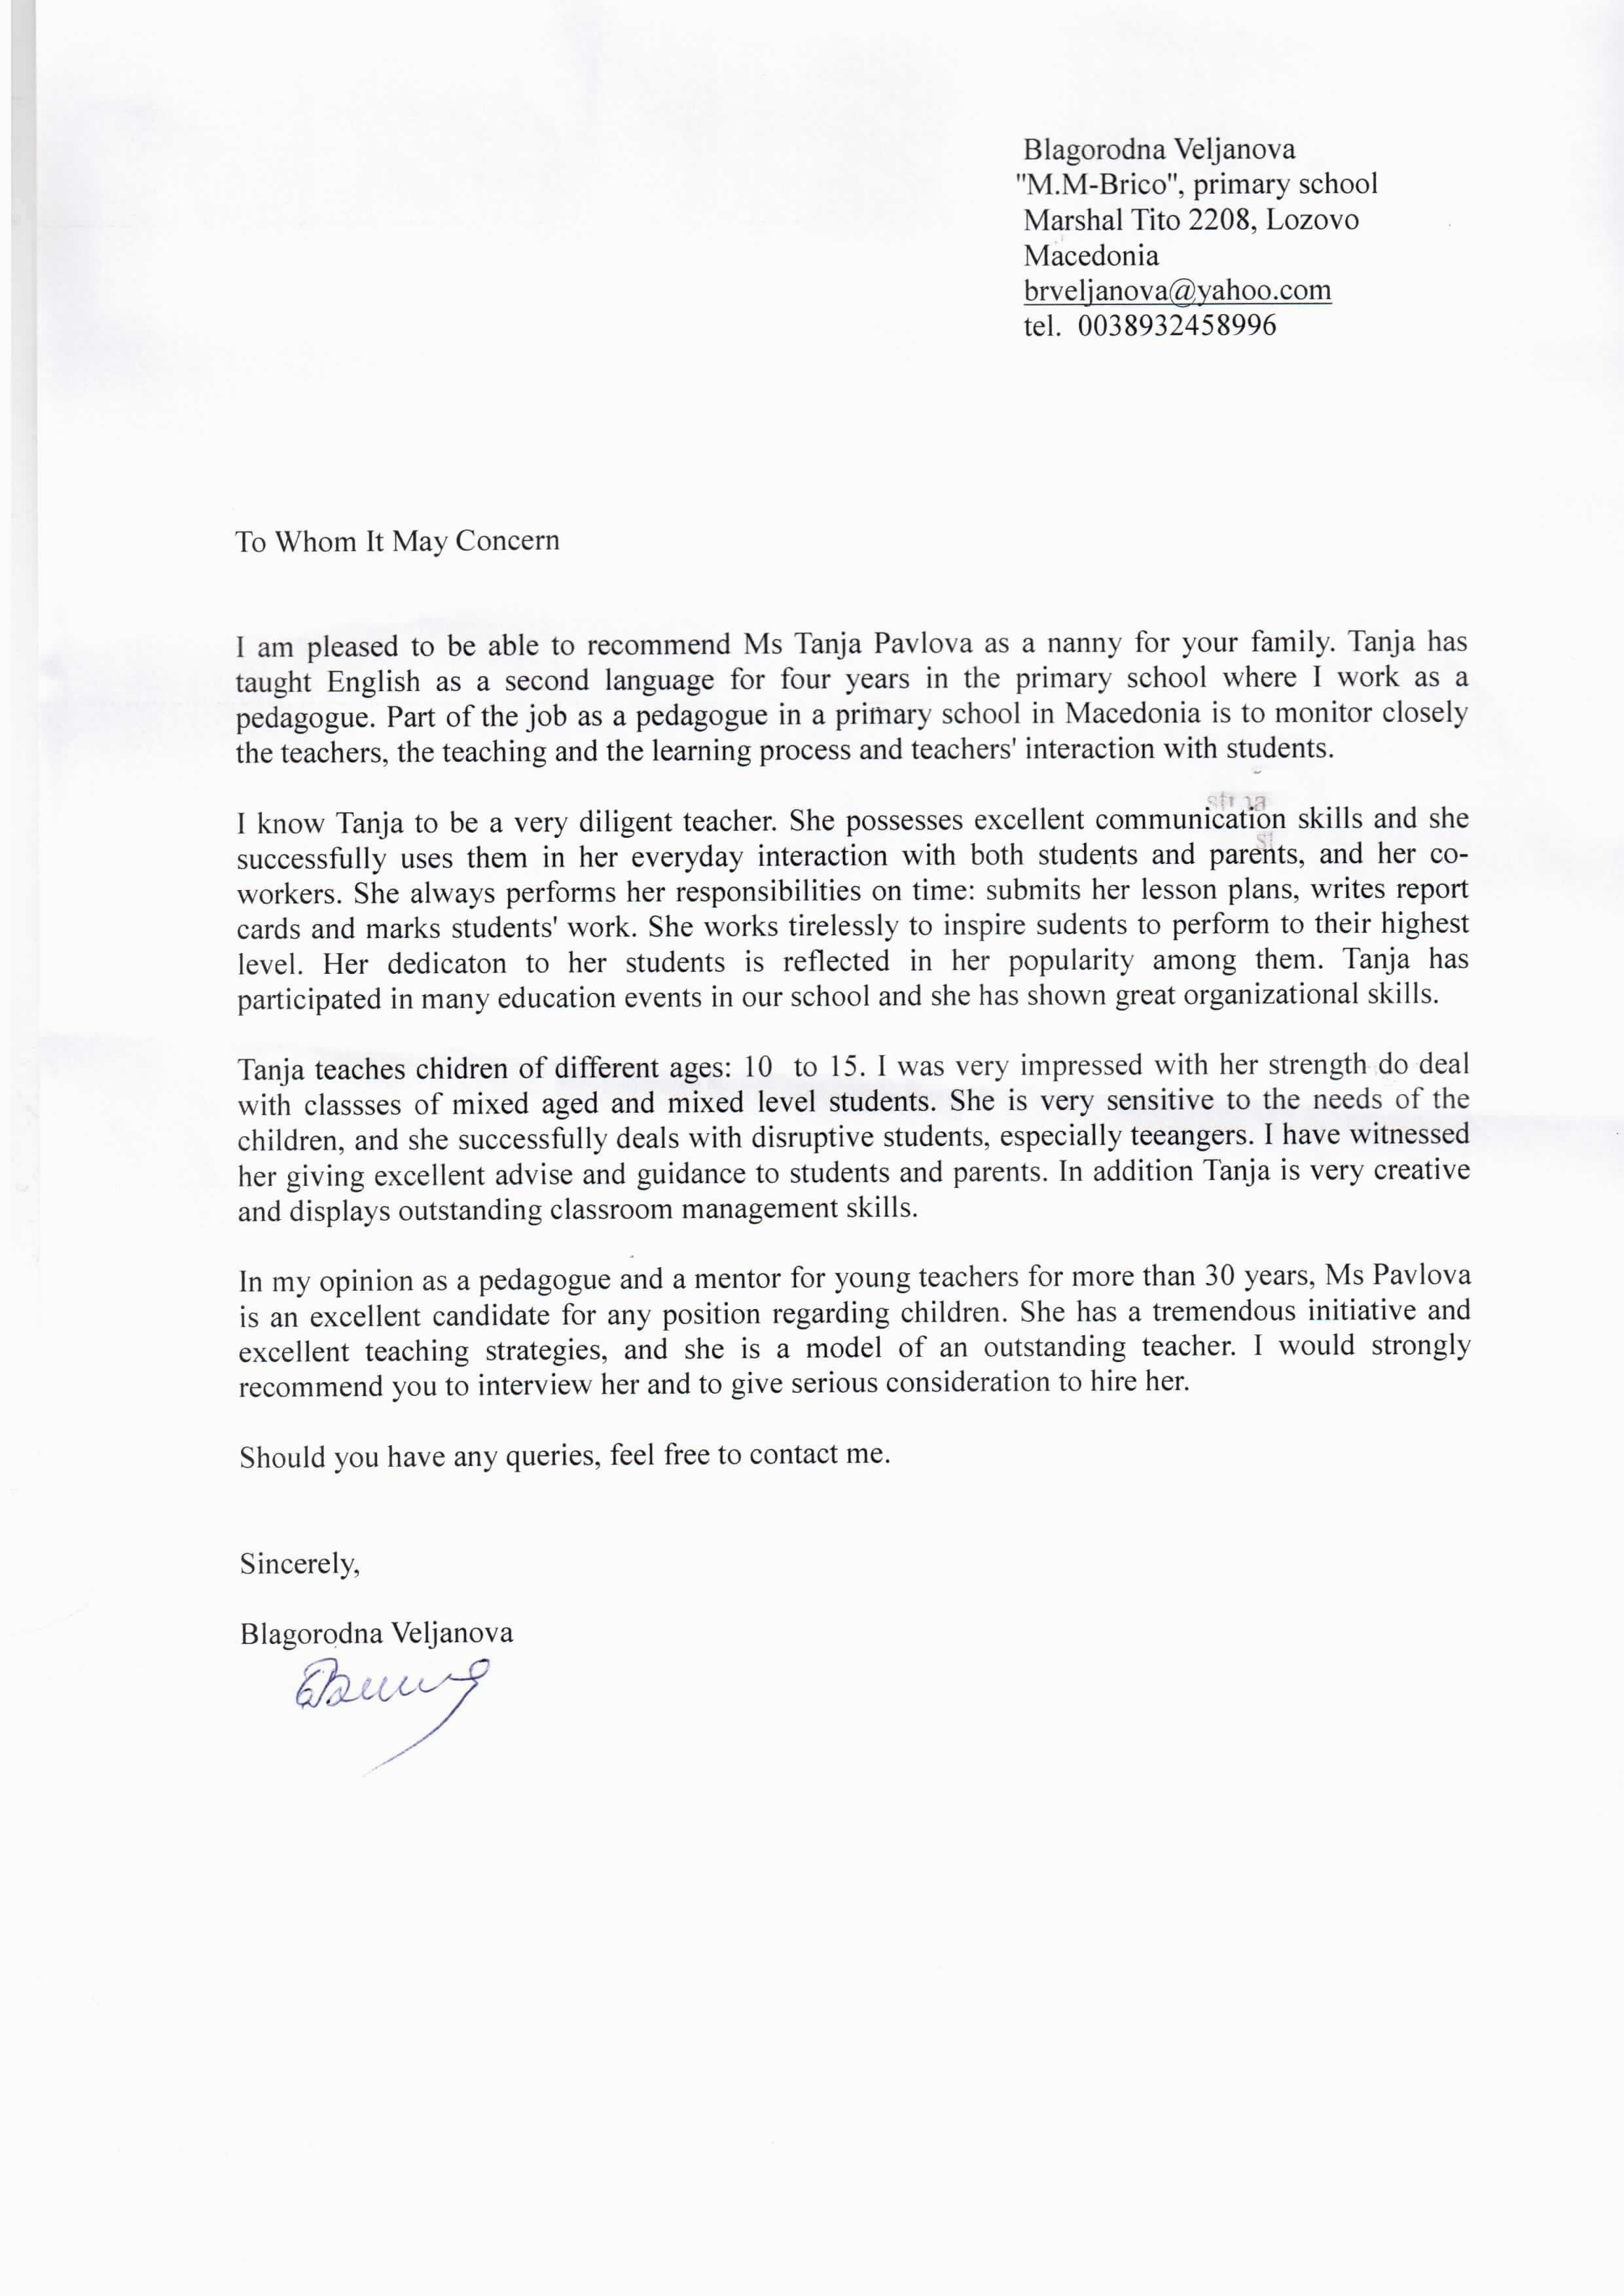 Recommendation Letter for Nanny Elegant Reference Letter Template Au Pair New Reference Letter for